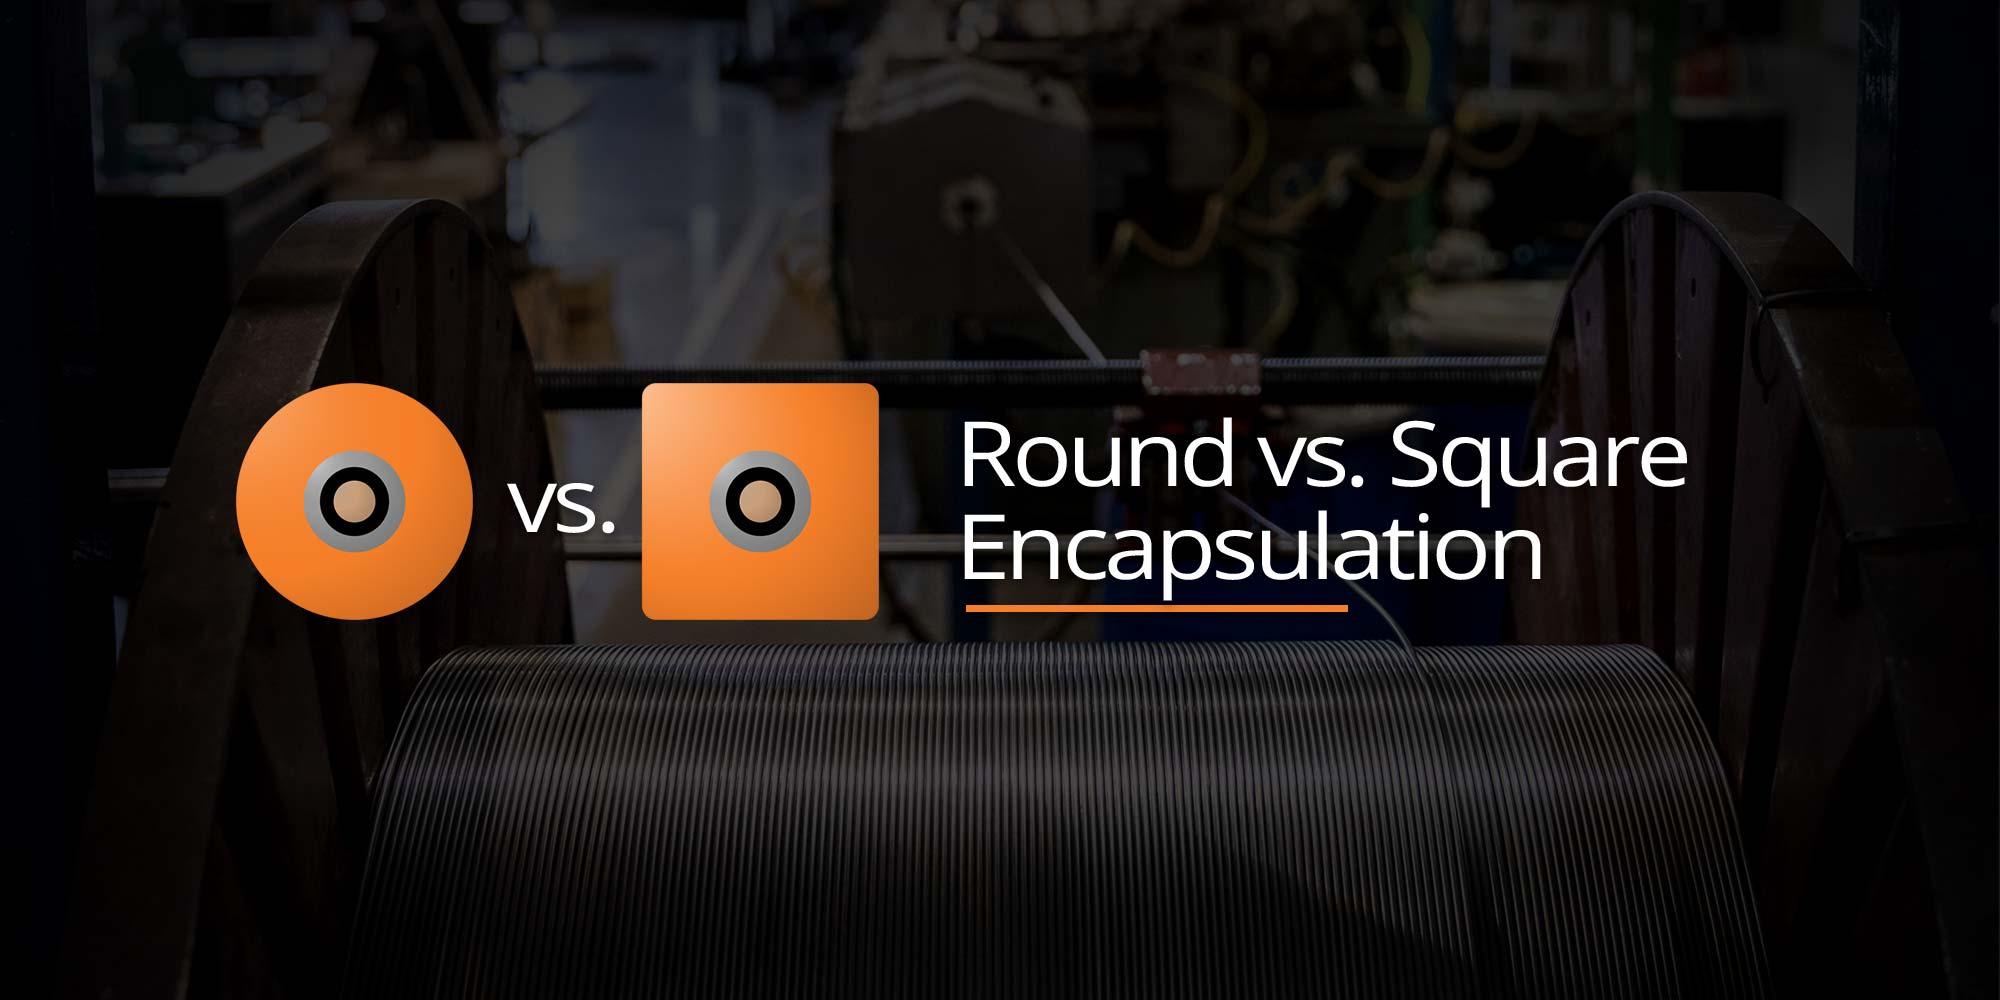 Downhole Instrument Cable: Round vs. Square Encapsulation